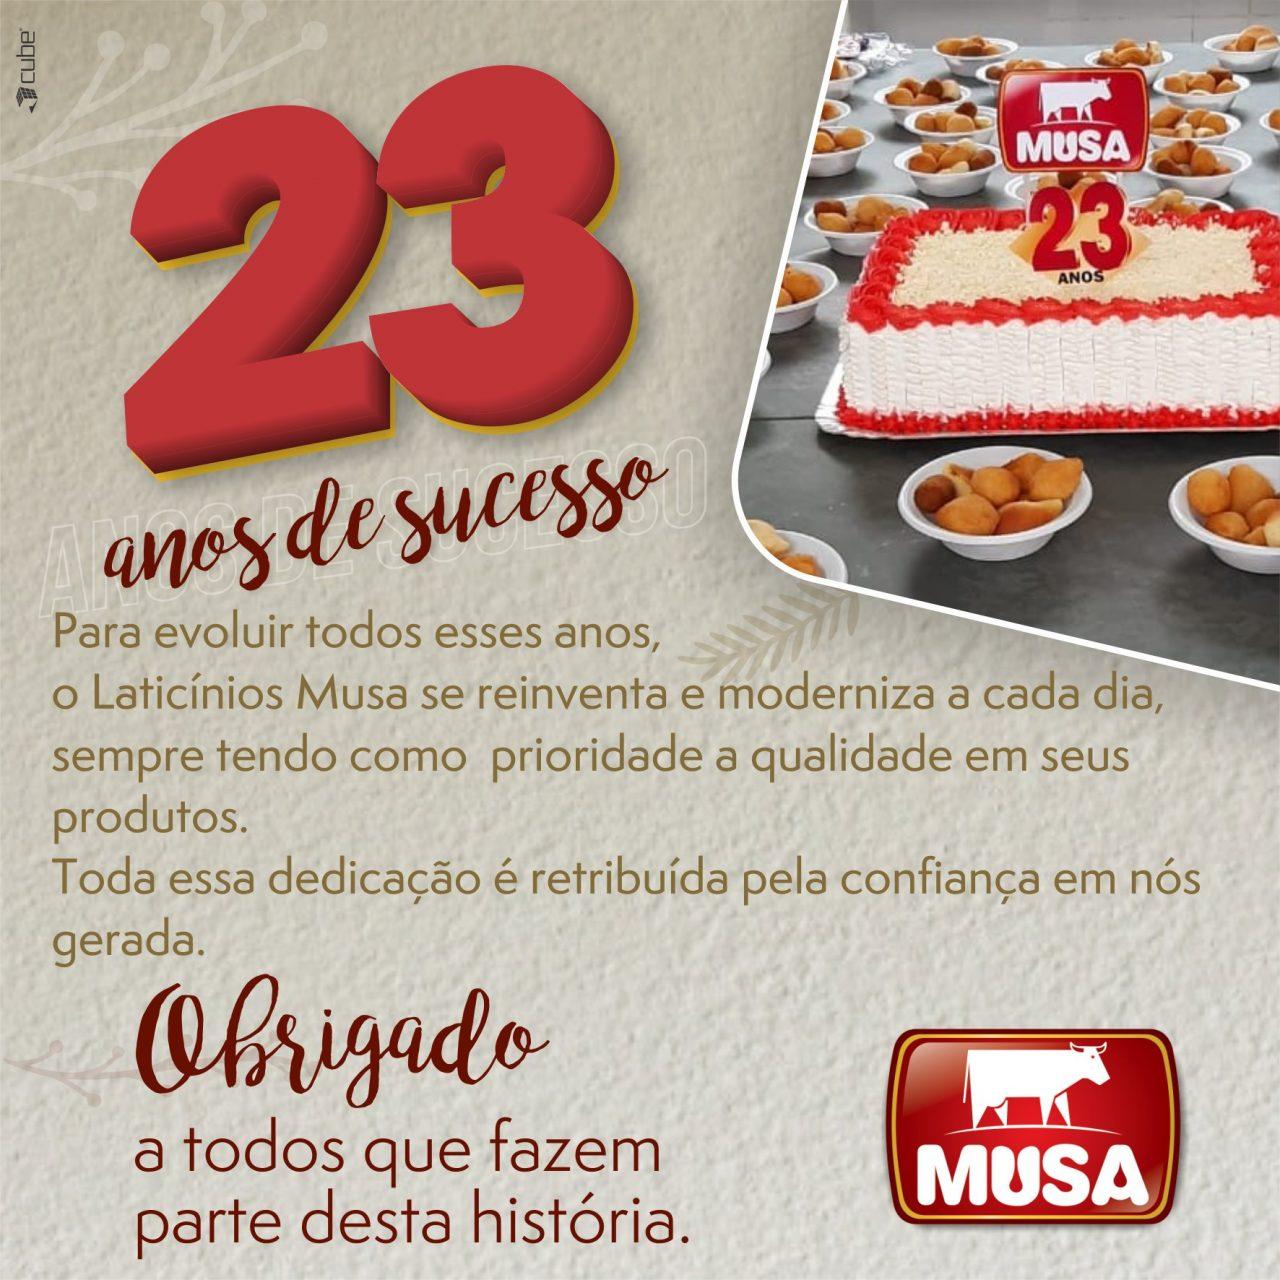 23anosMusa